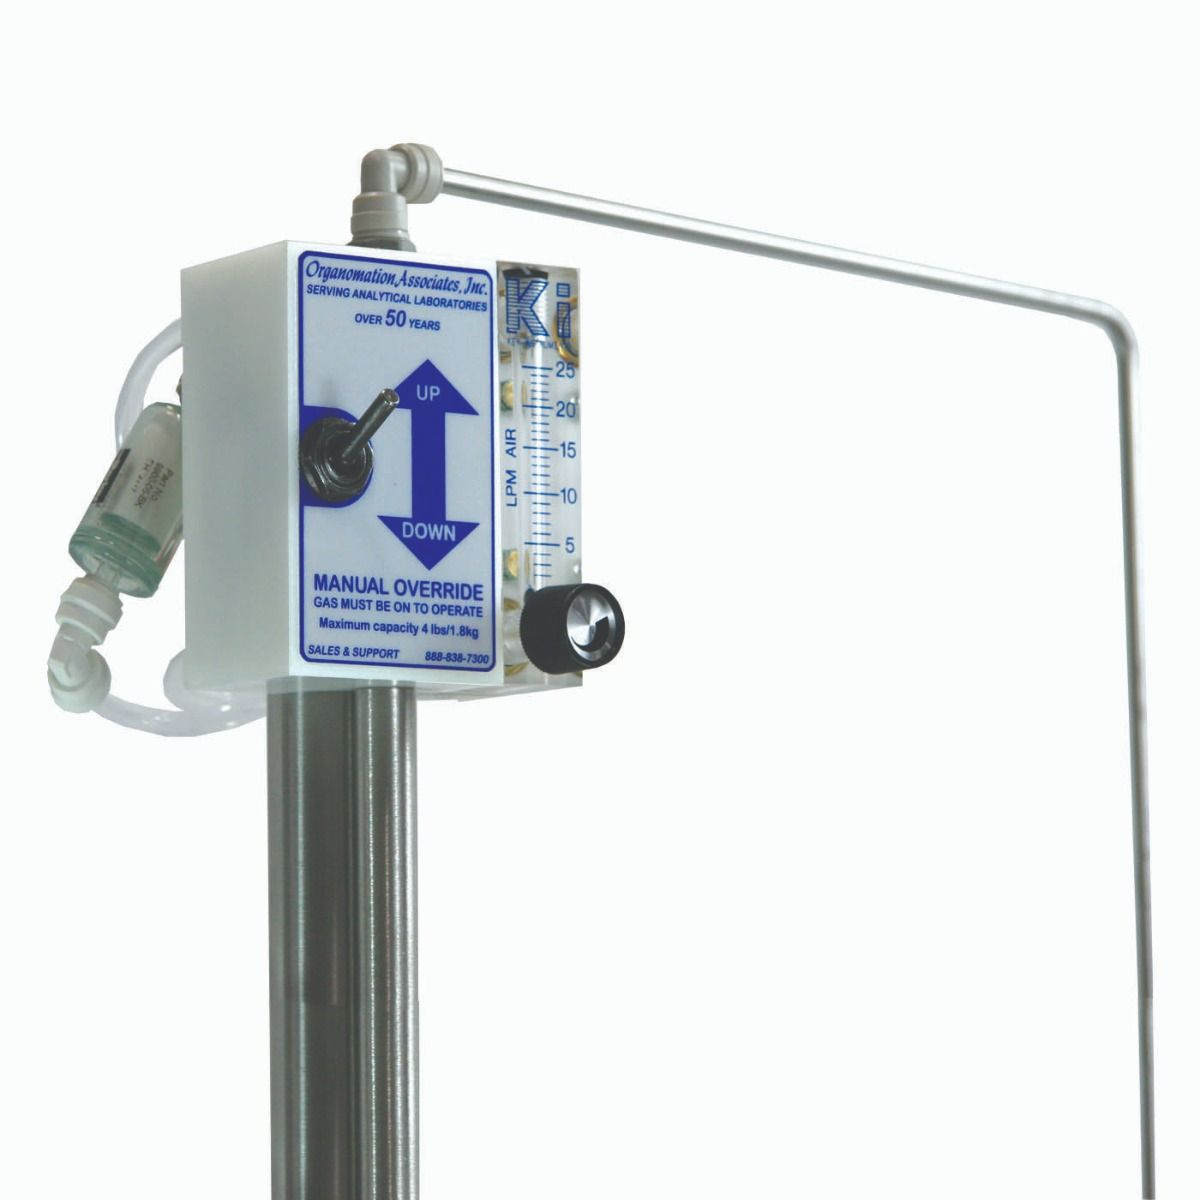 Organomation Automatic 20 Position N-EVAP® Nitrogen Evaporator